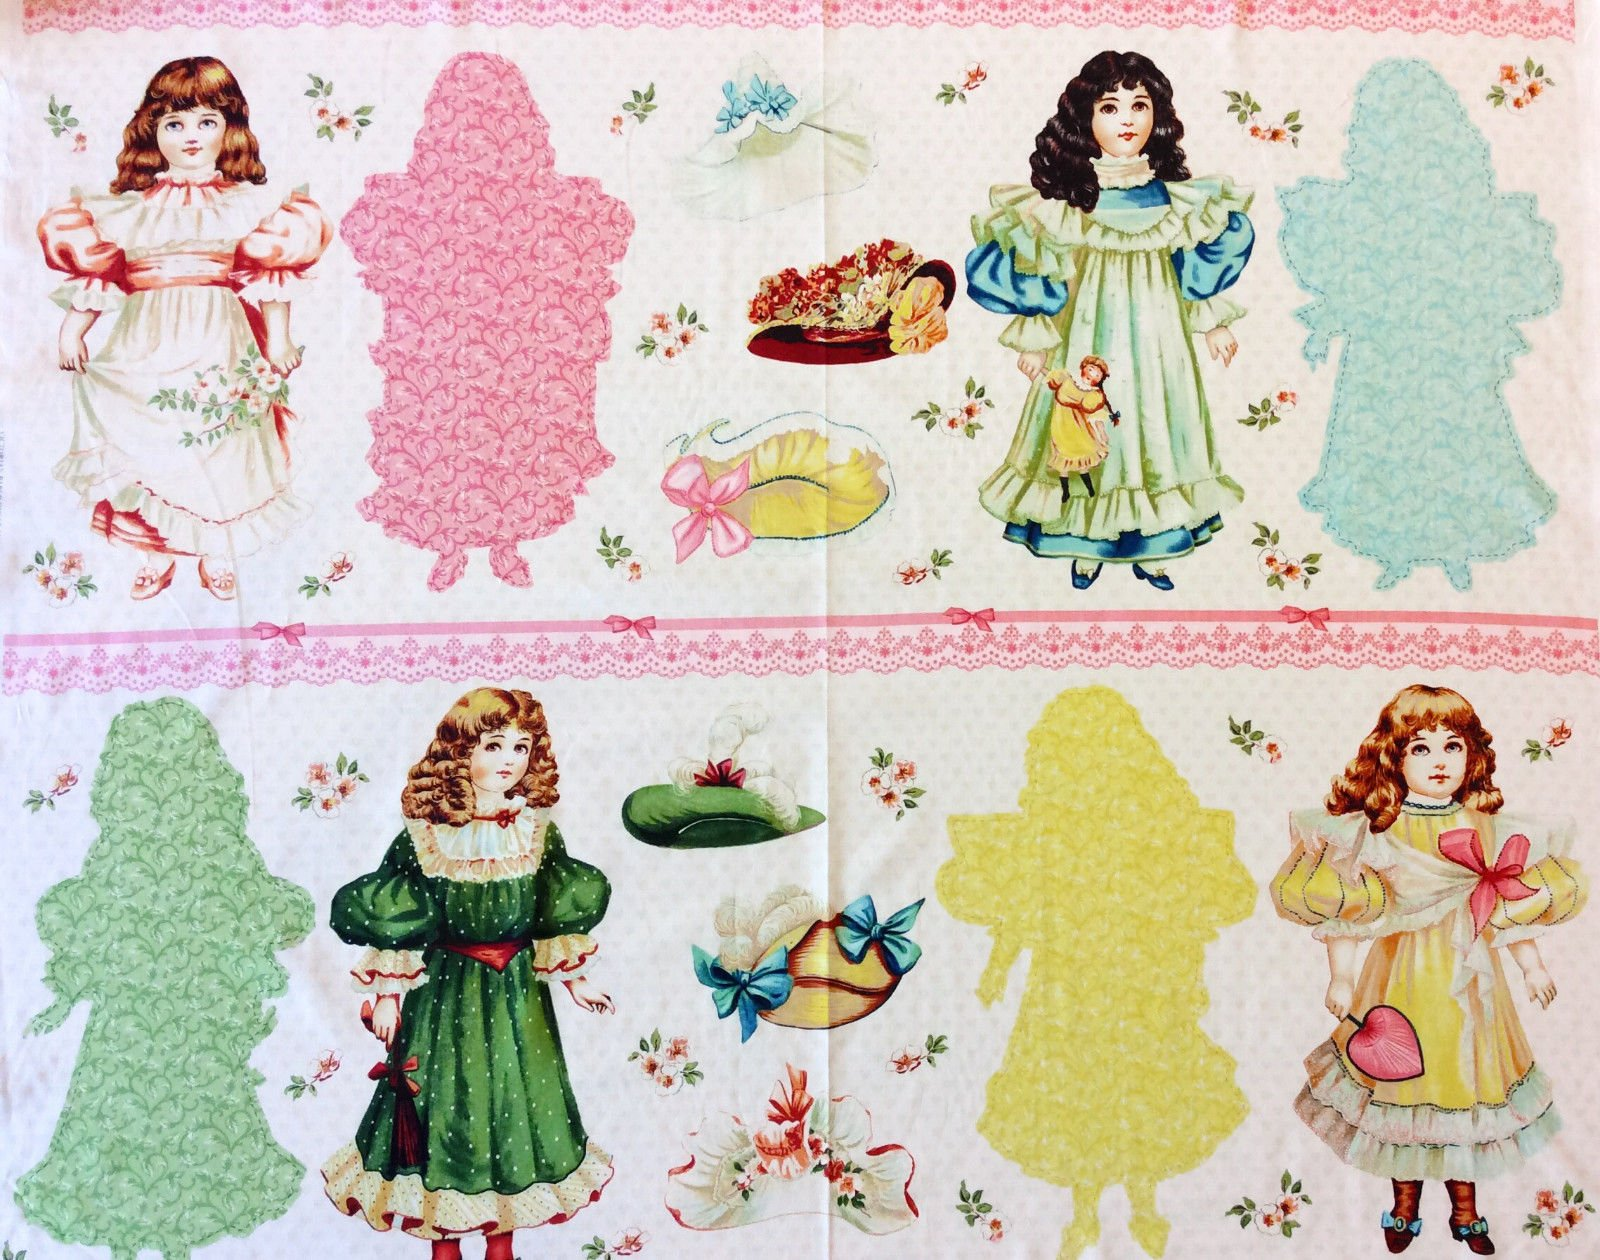 PNL145 Vintage Victorian Paper Dolls Toys Retro Cotton Fabric Quilt Fabric Panel